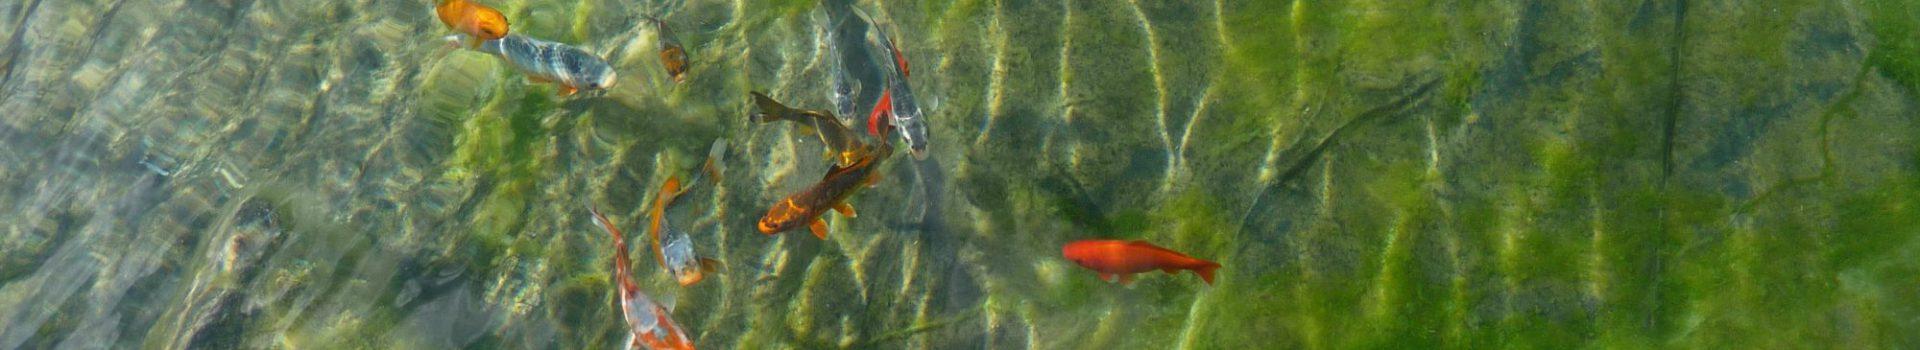 Carpes Kois, shubukins et poissons rouges dans une piscine naturelle